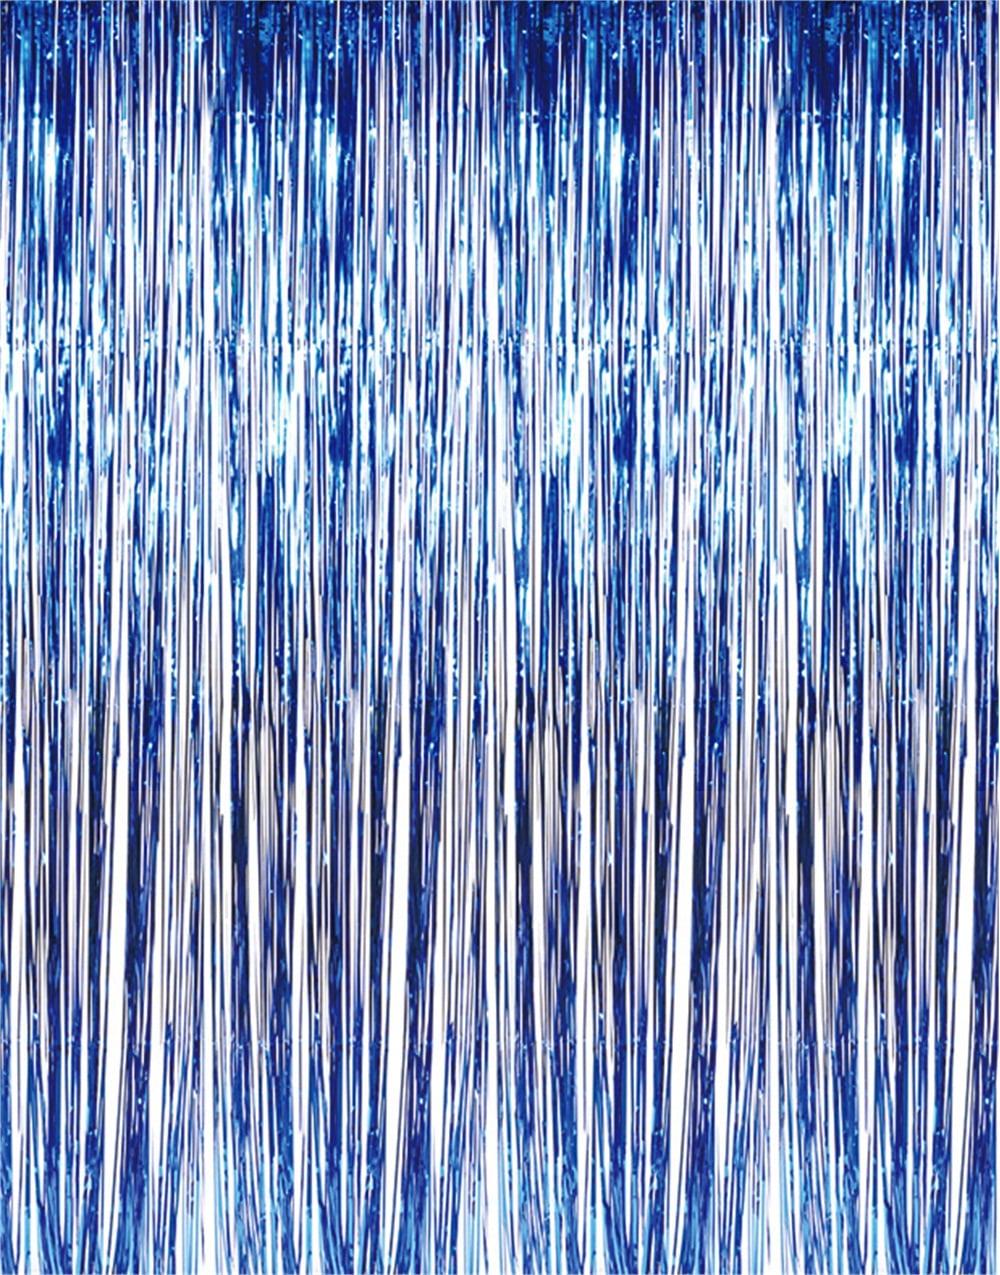 2 Packs Foil Fringe Backdrop Blue 3FTX8FT Metallic Door Window Curtain Tinsel